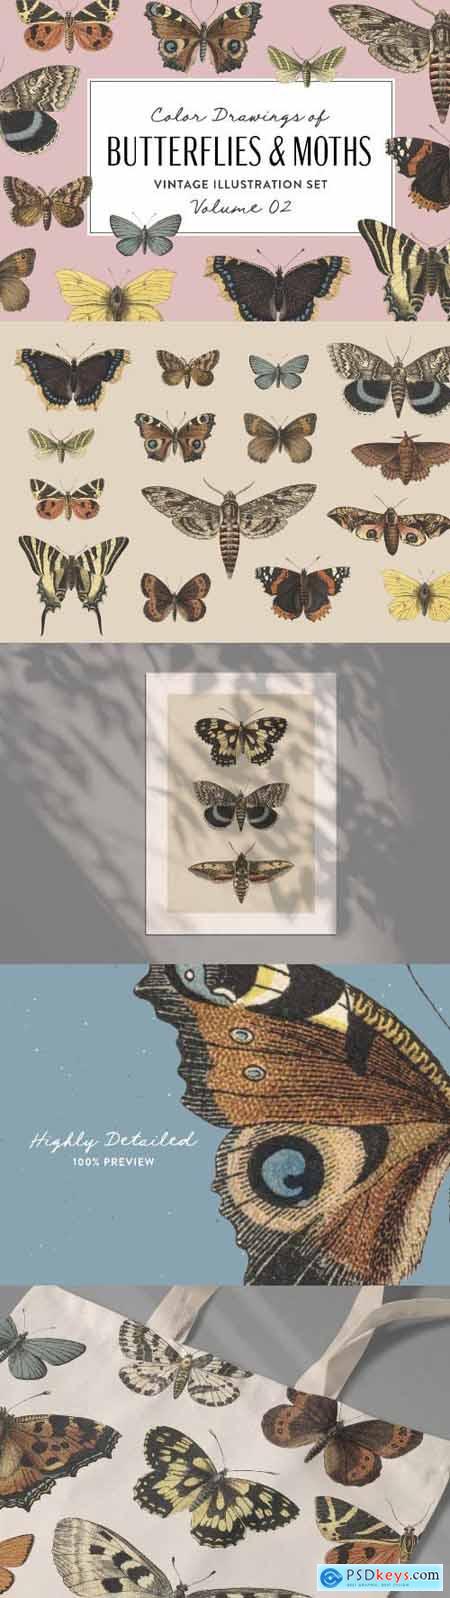 Butterflies & Moths Vintage Graphics Vol. 2